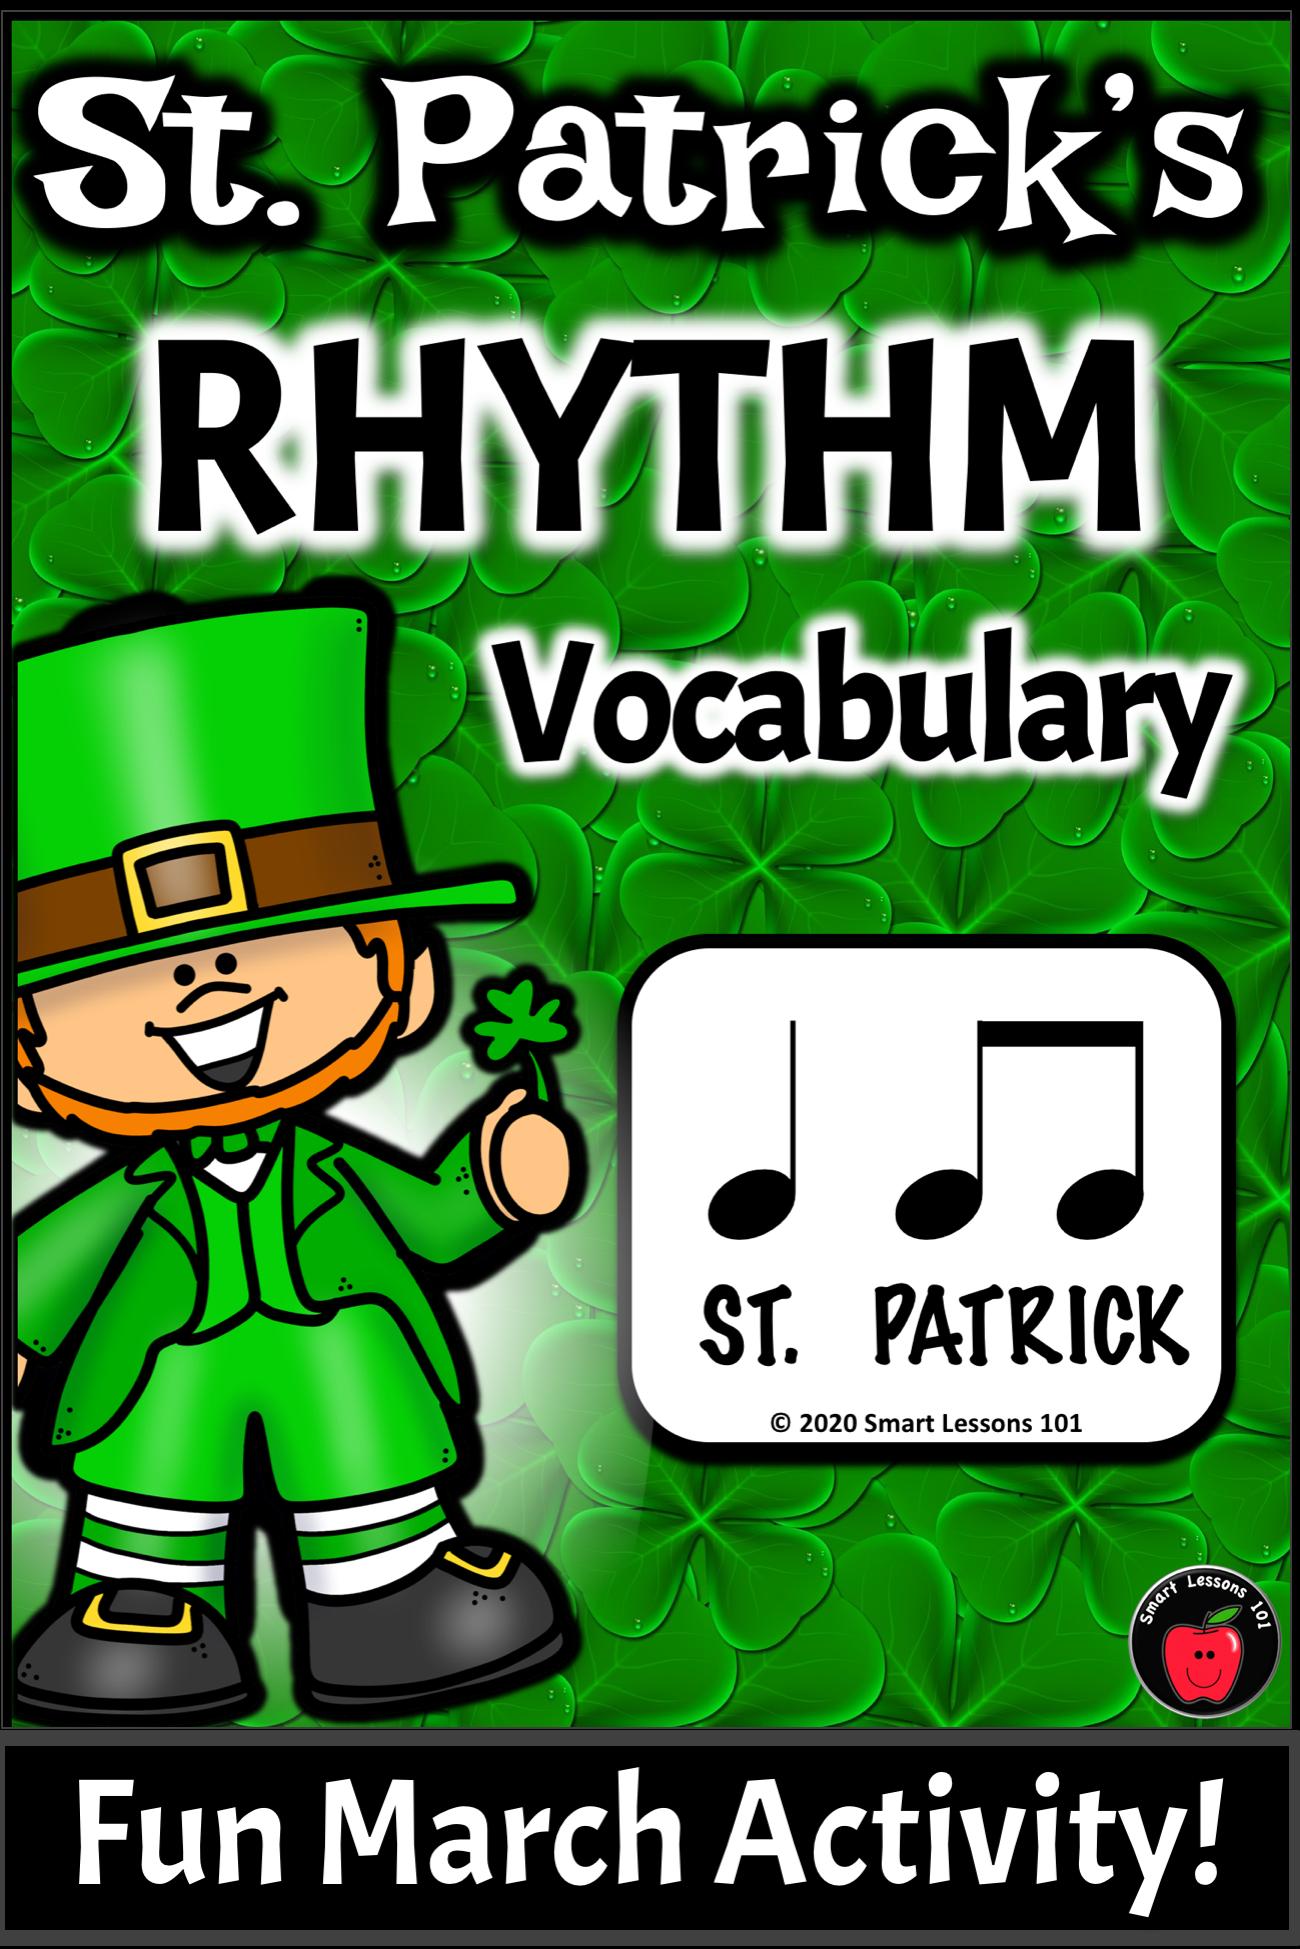 St Patrick S Day Rhythms St Patrick S Day Music Activity